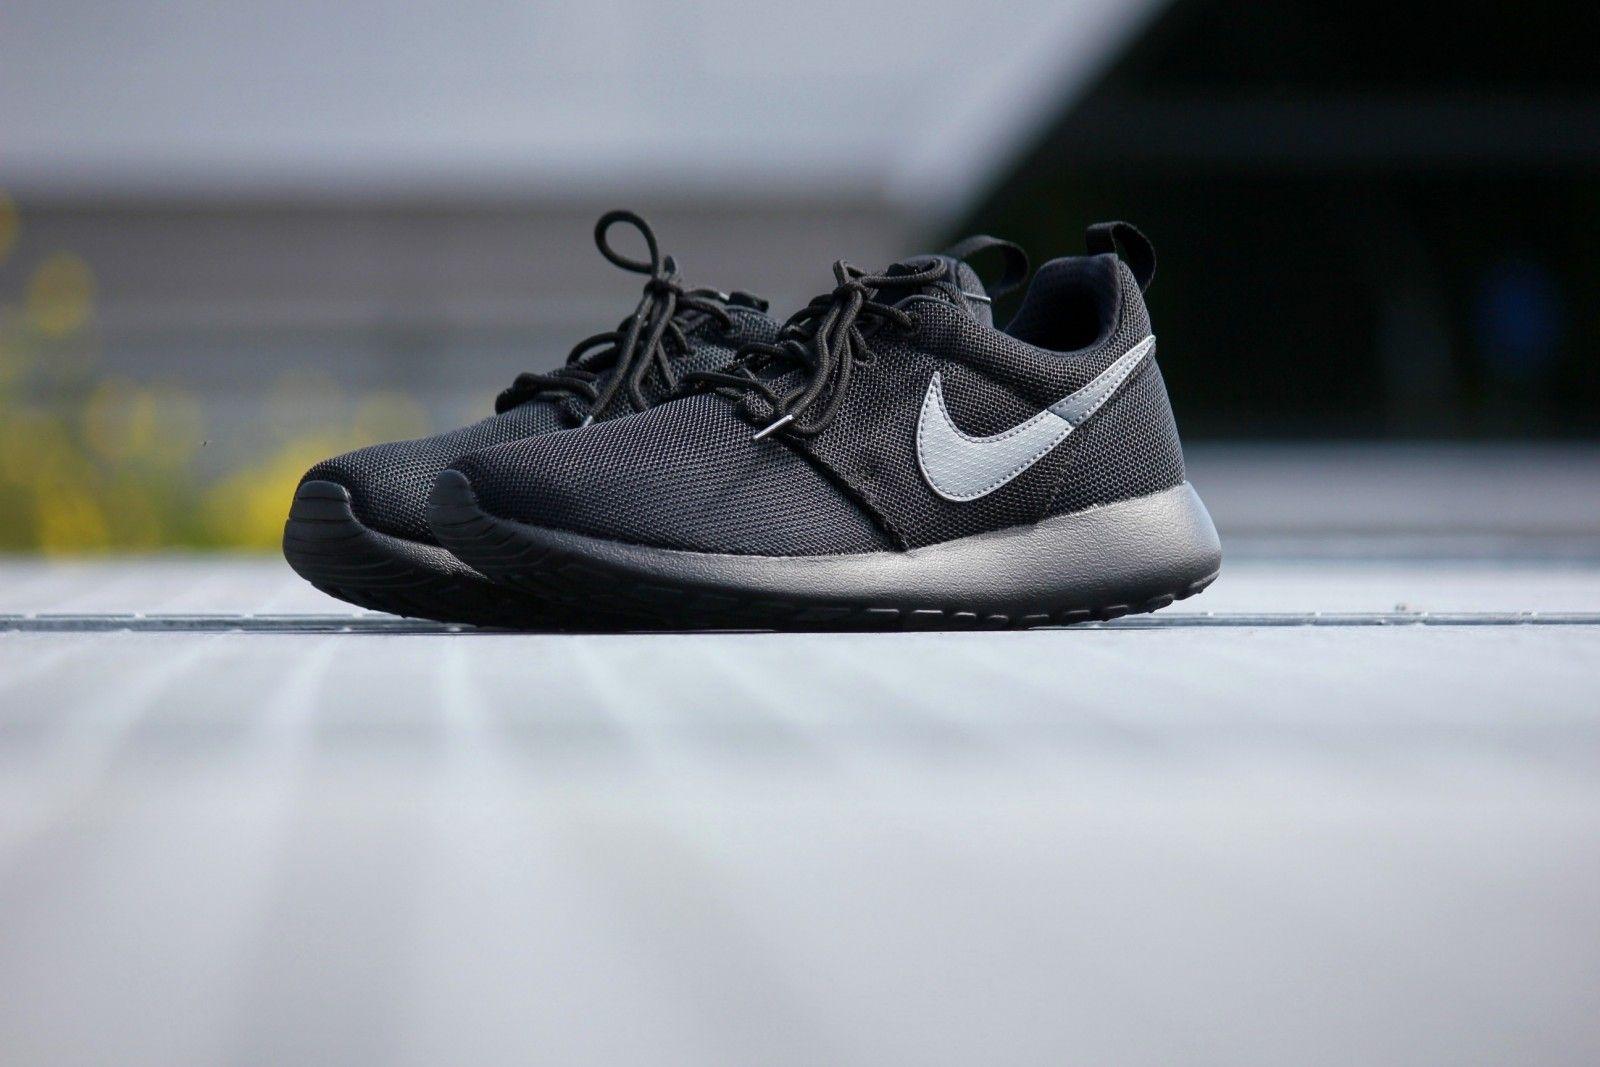 4f0ef084d594 ... nike roshe one black cool grey 599728 017